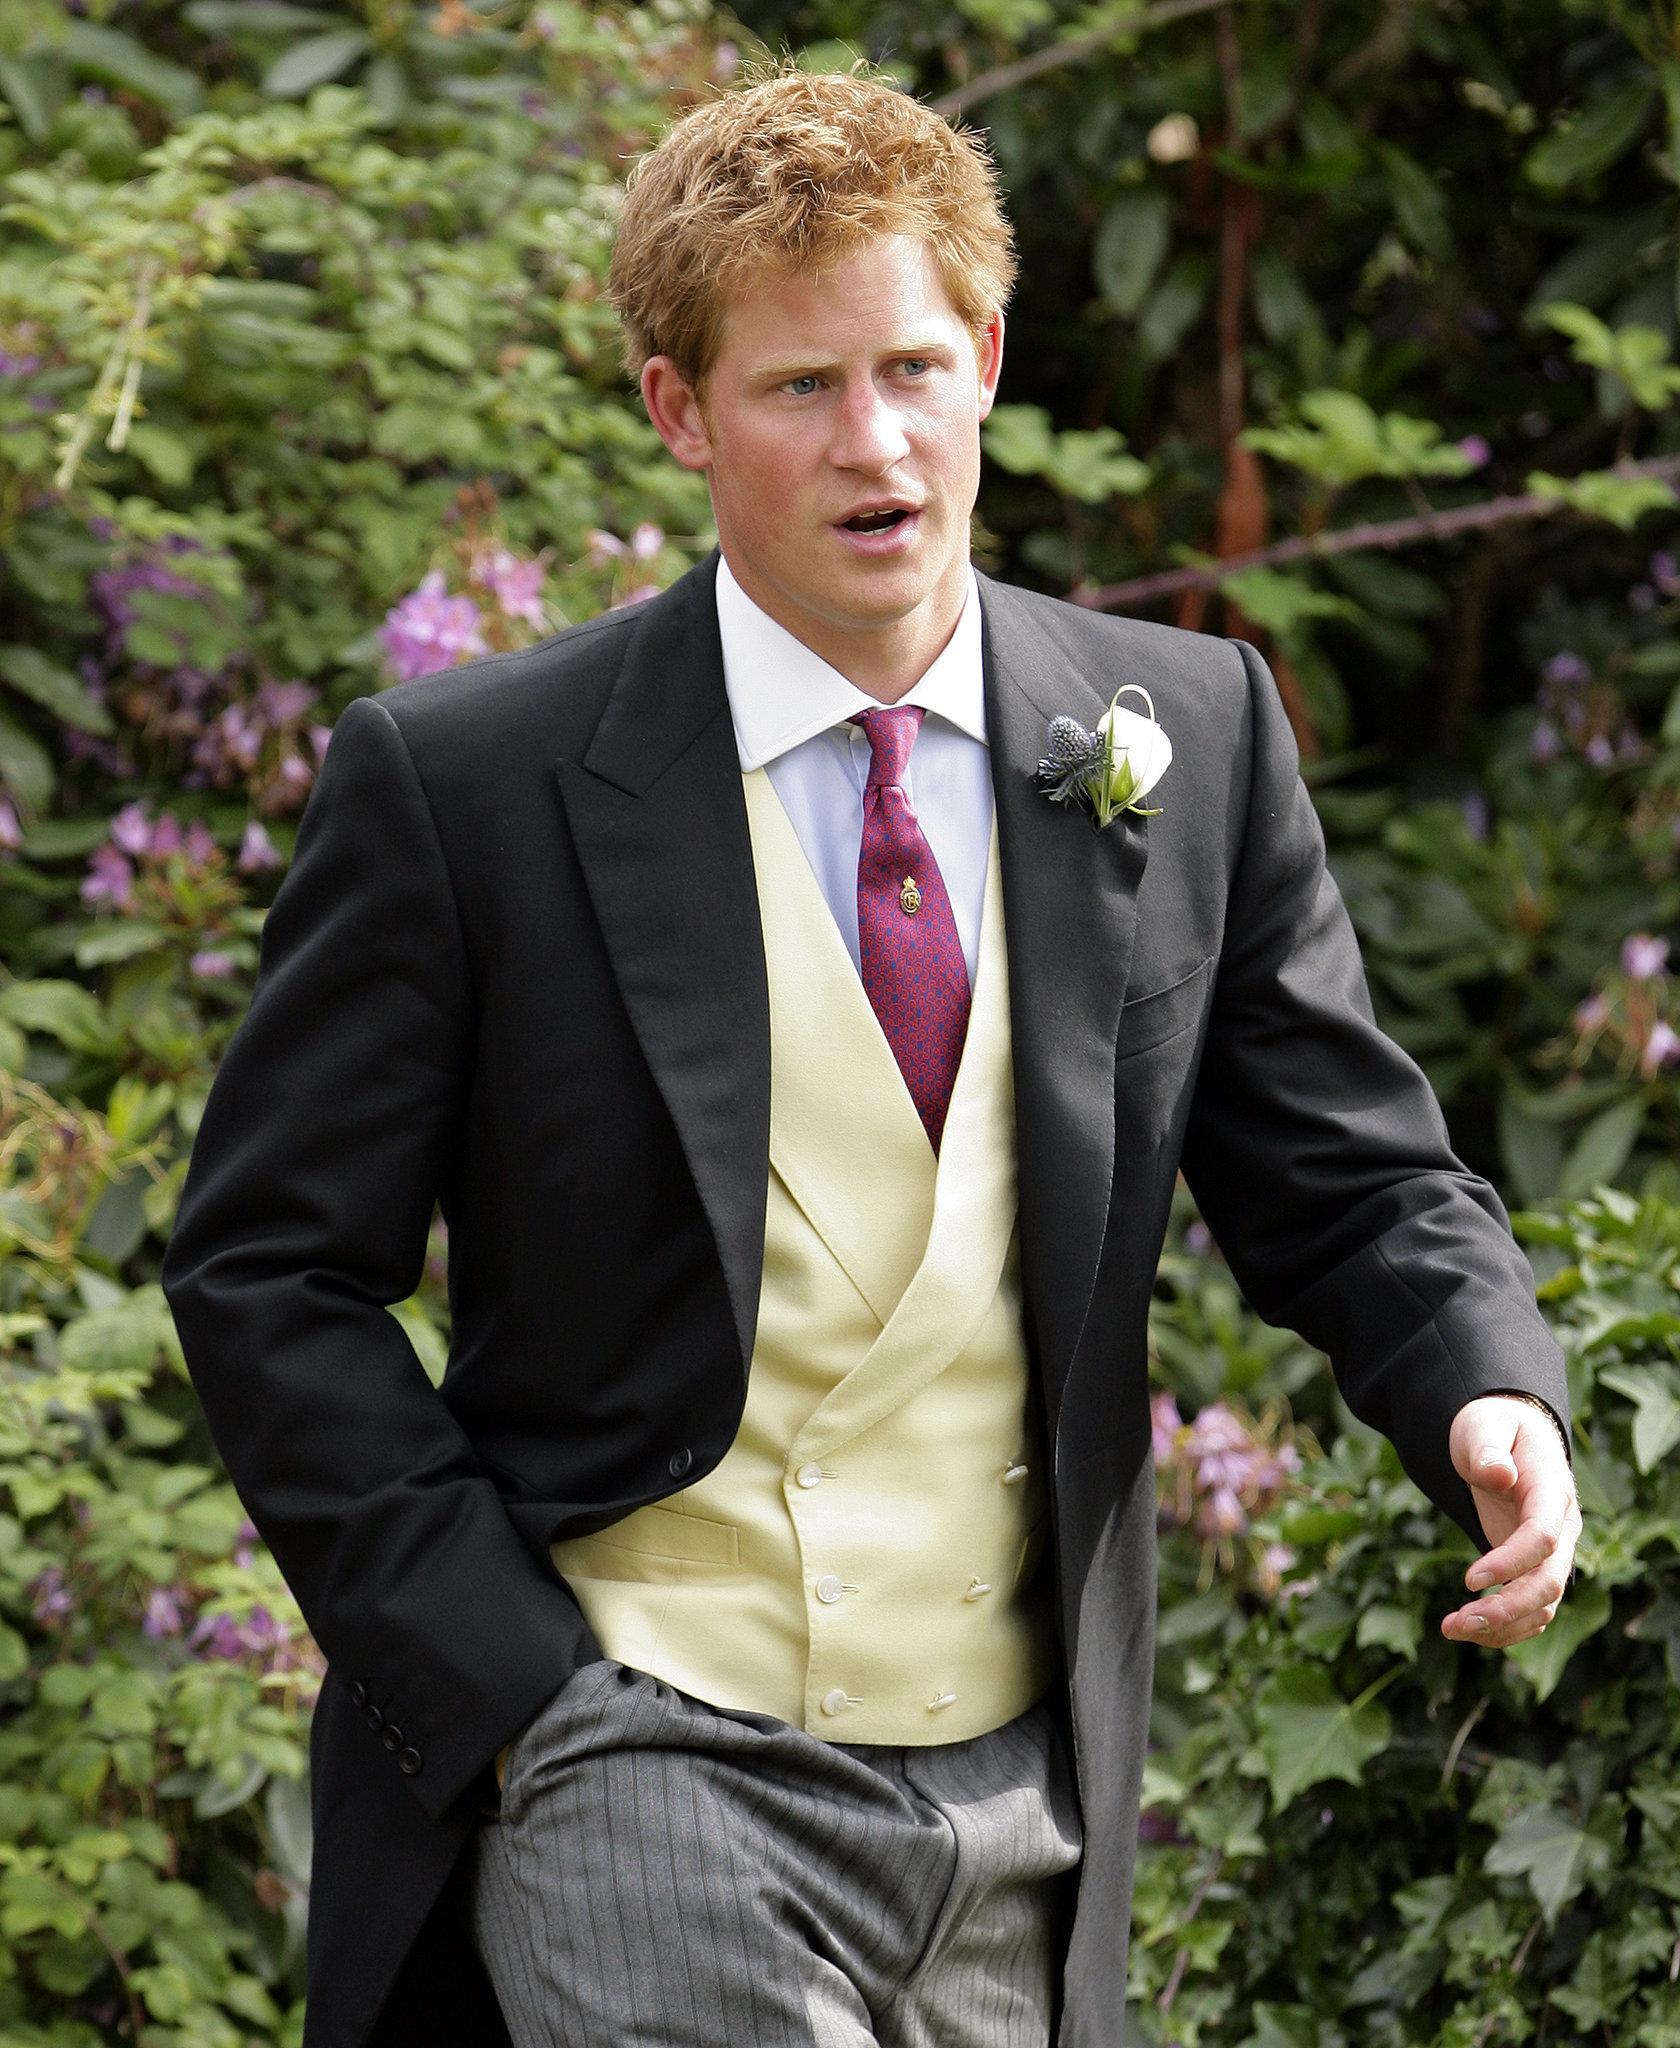 Harry attended a friend's wedding in July 2010.